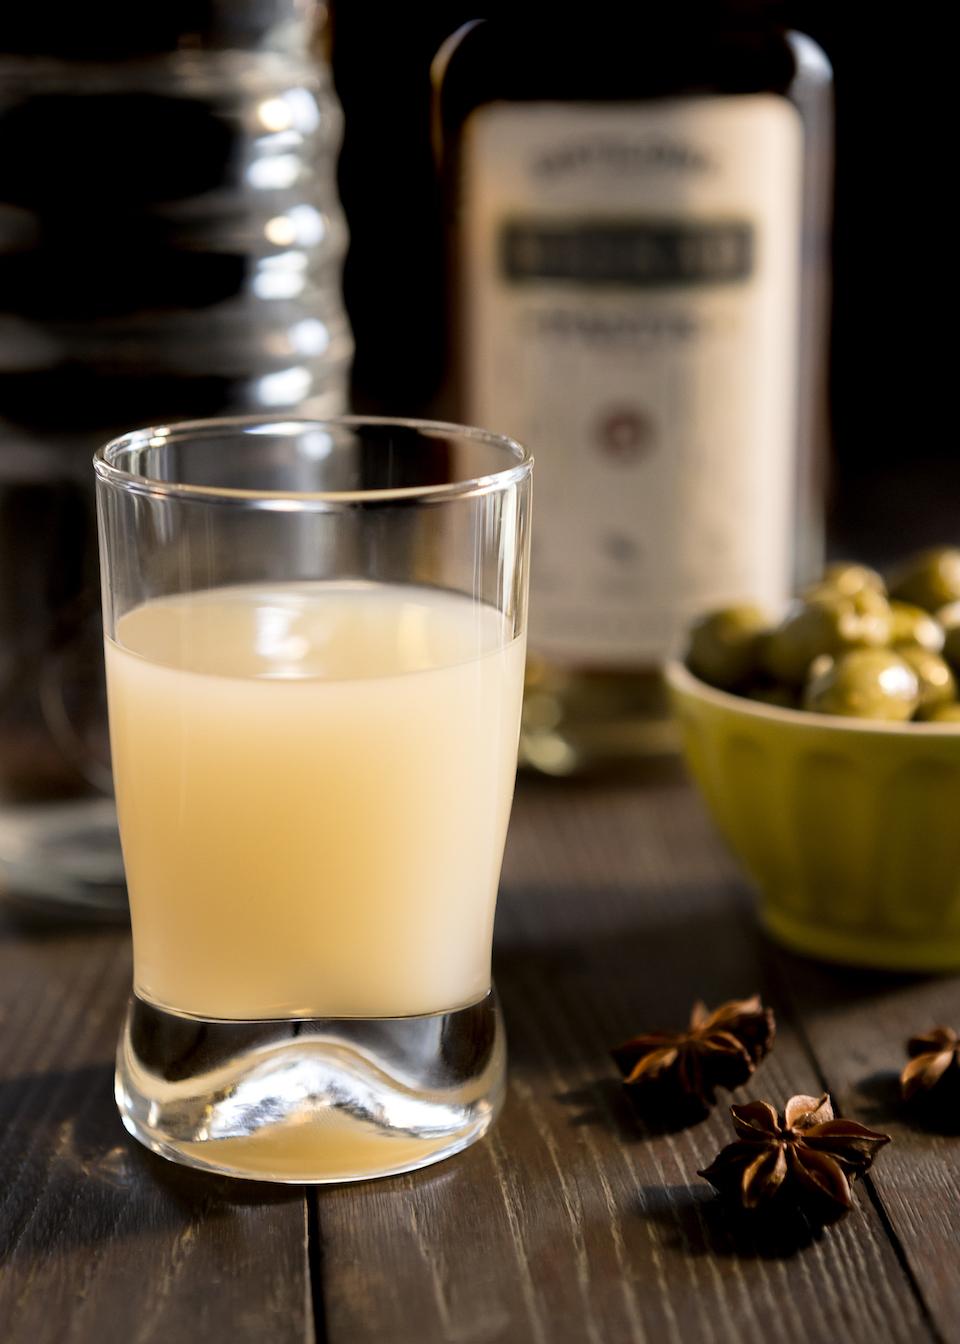 Verre de Pastis Meskad Distiloire